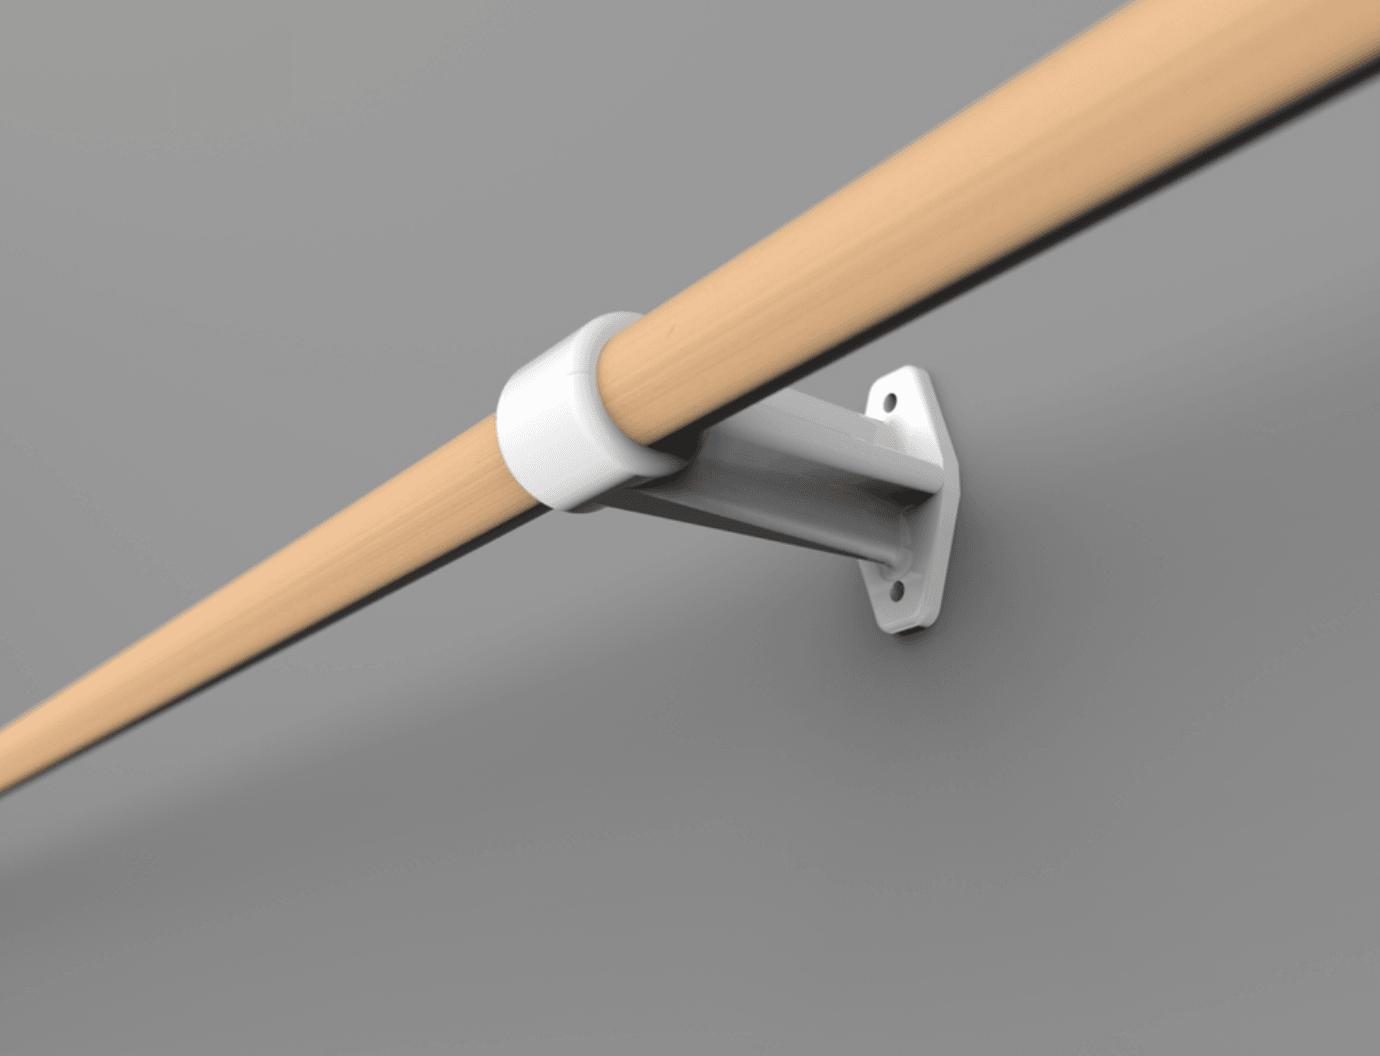 Capture d'écran 2018-04-09 à 15.54.24.png Download free STL file Curtain rod support • 3D printing template, yoyo-31